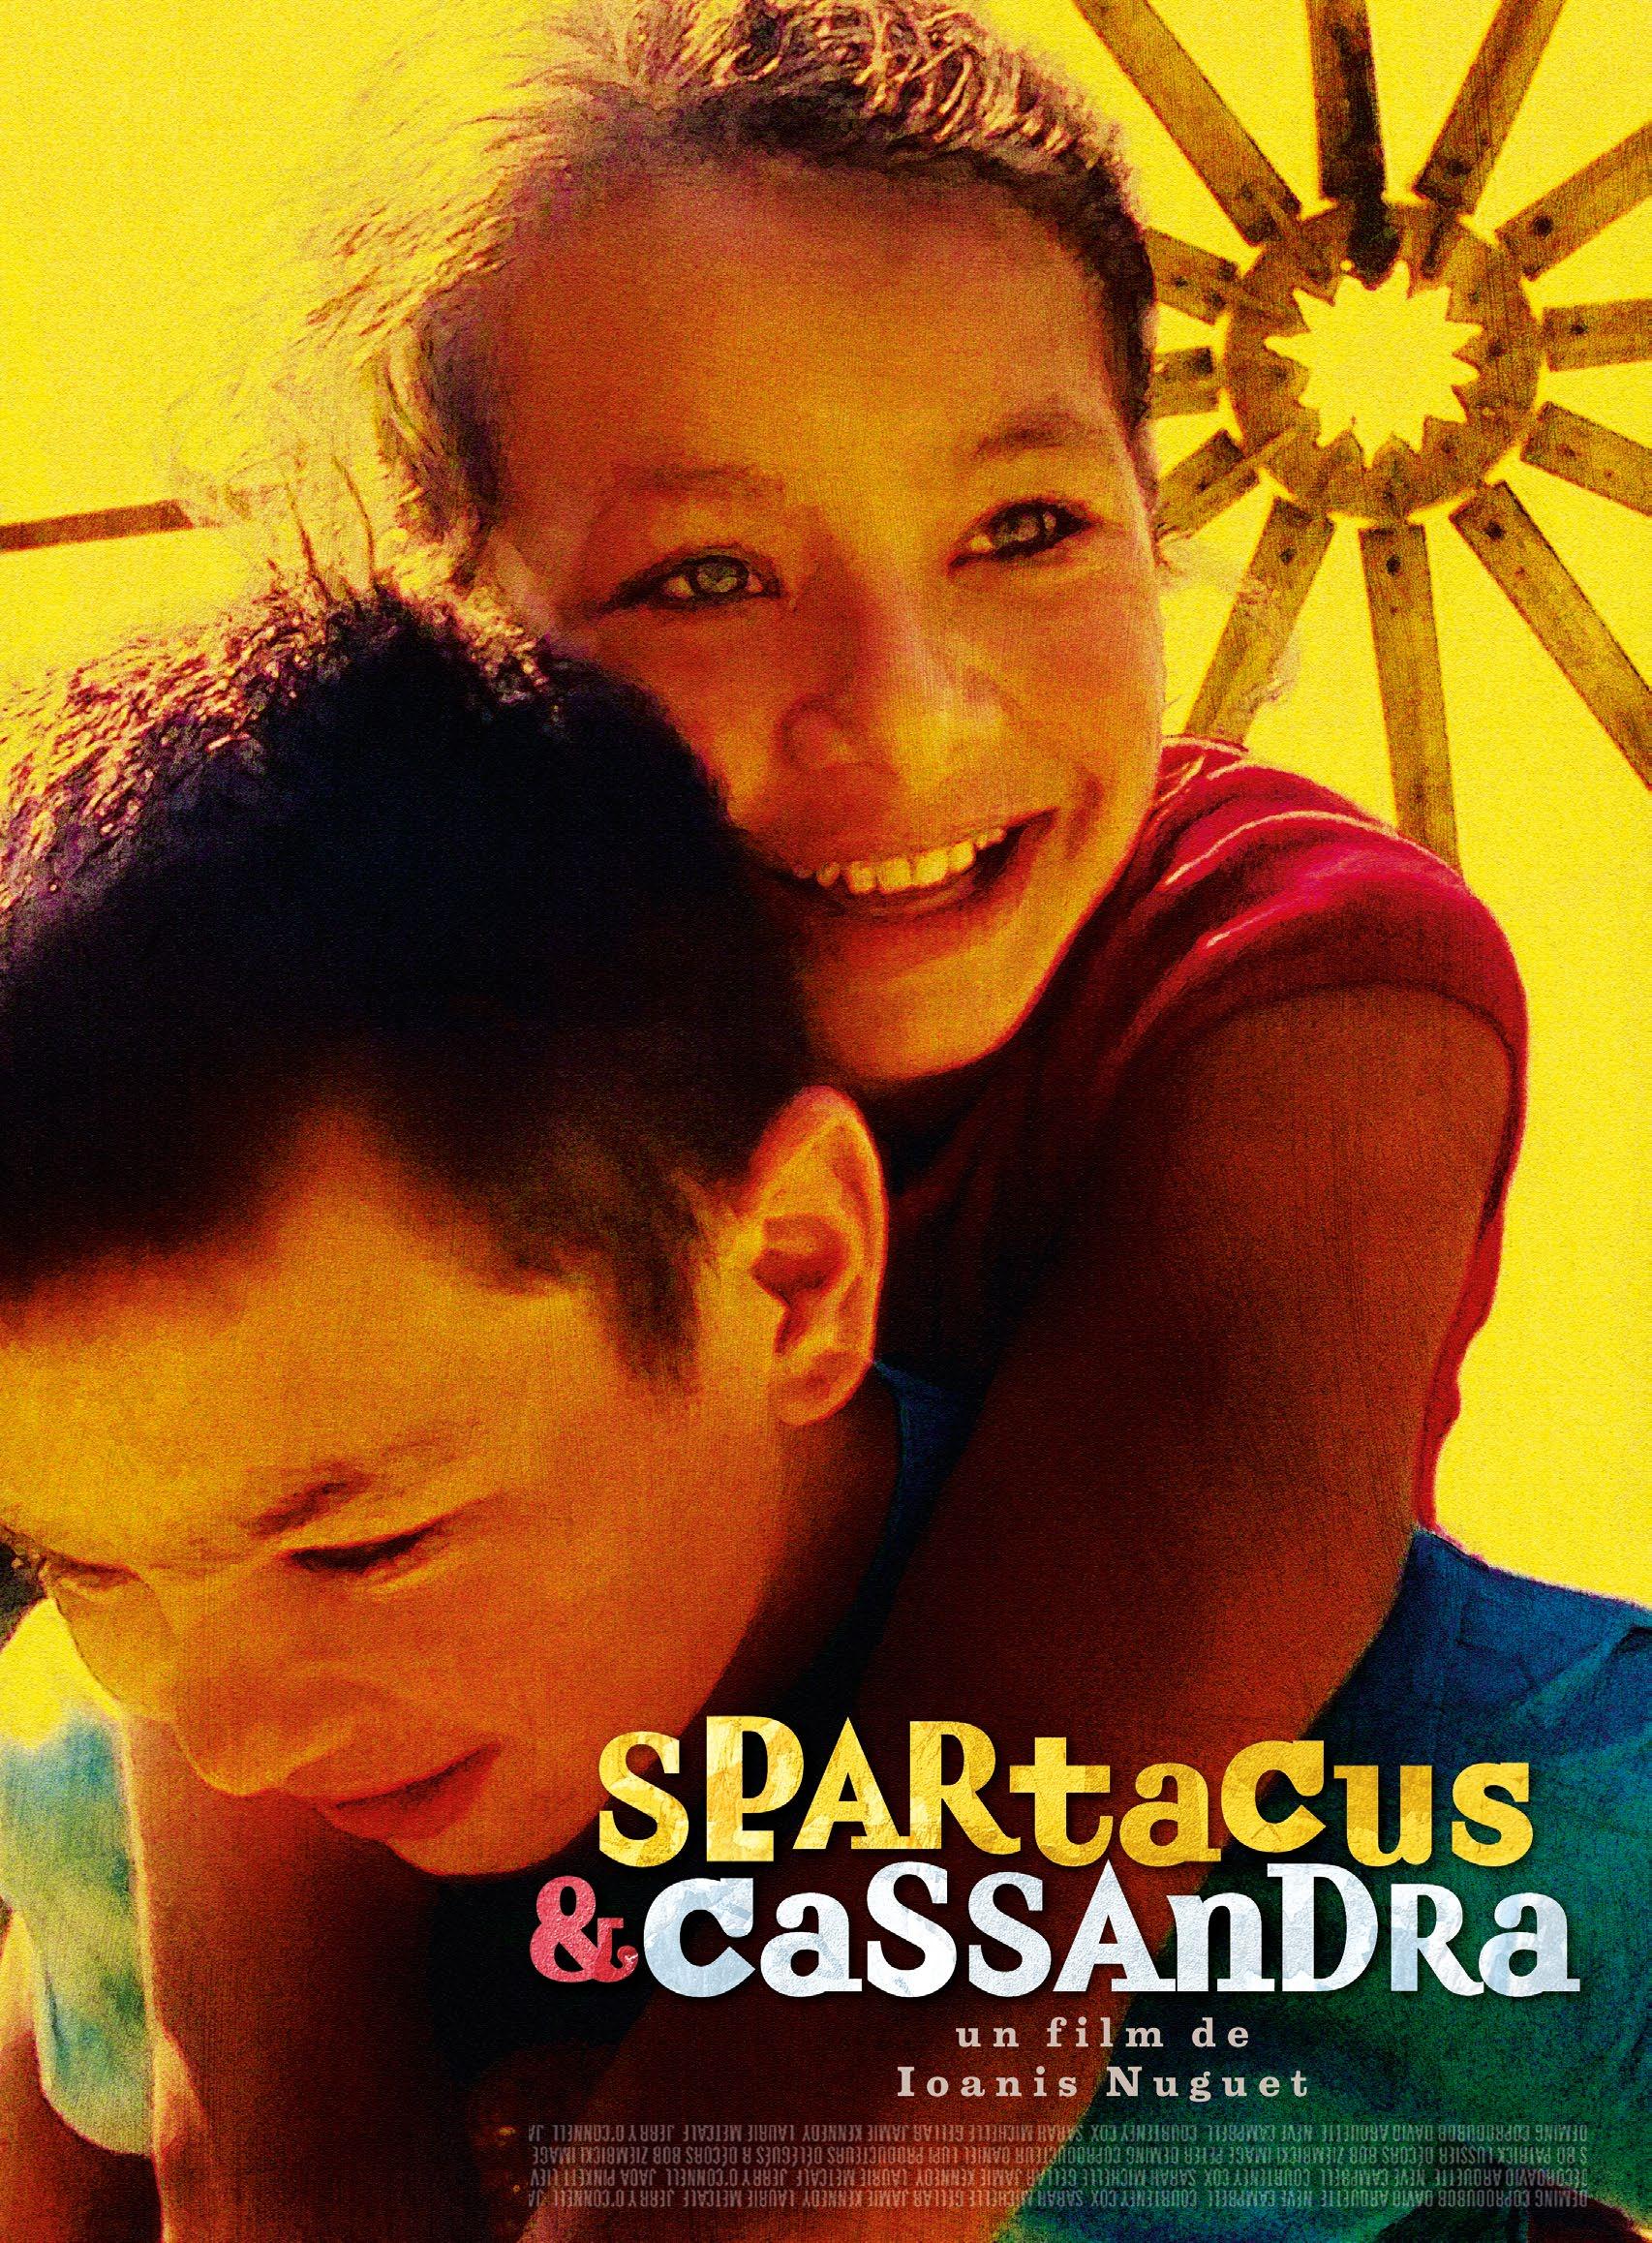 Filme Spartacus inside spartacus & cassandra - film 2014 - filmstarts.de